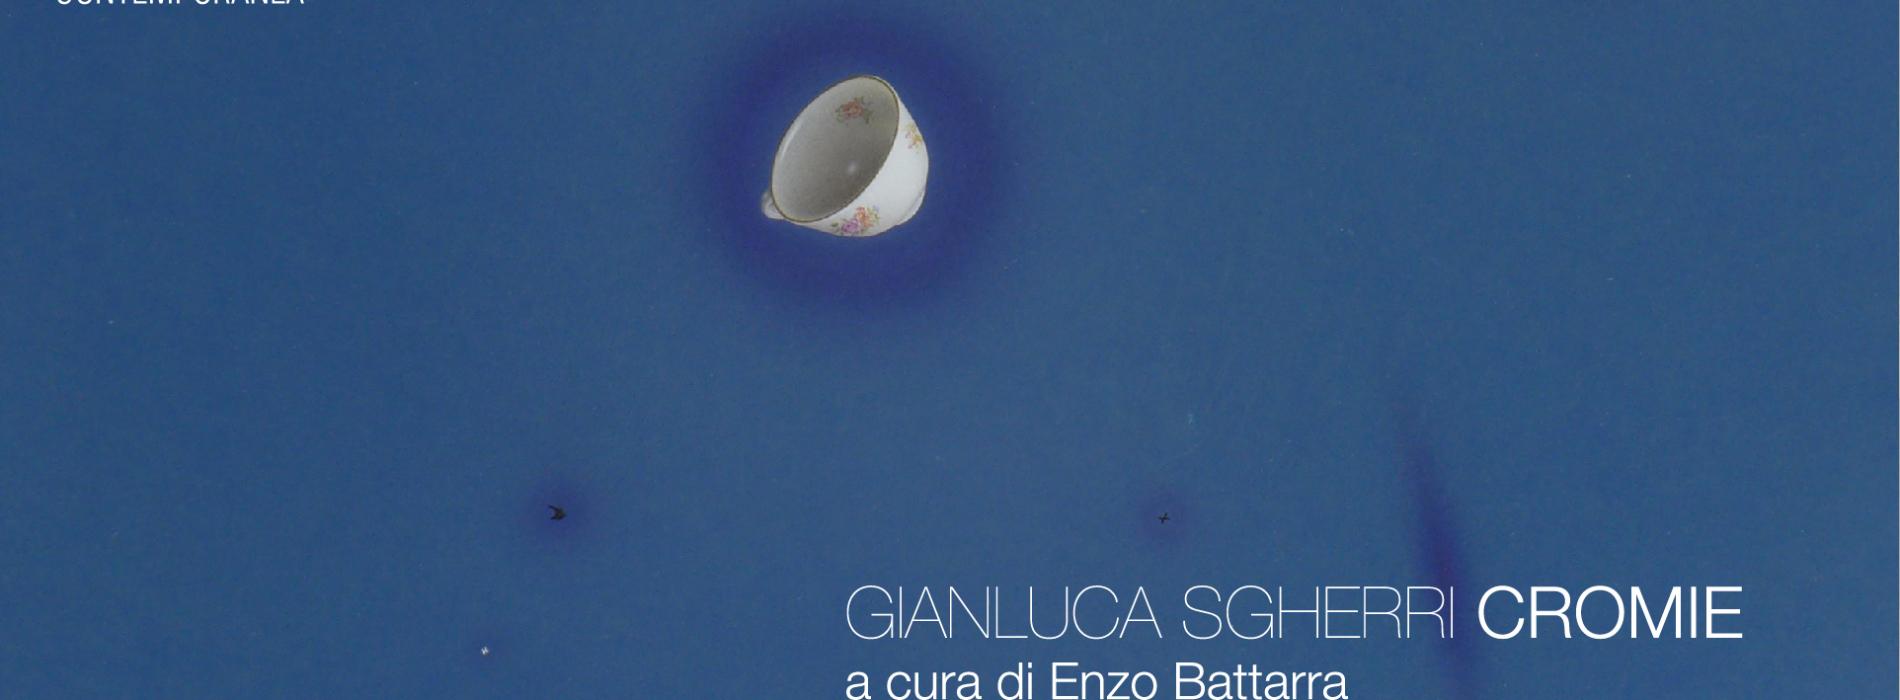 Centometriquadri di arte, le Cromie astrali di Gianluca Sgherri